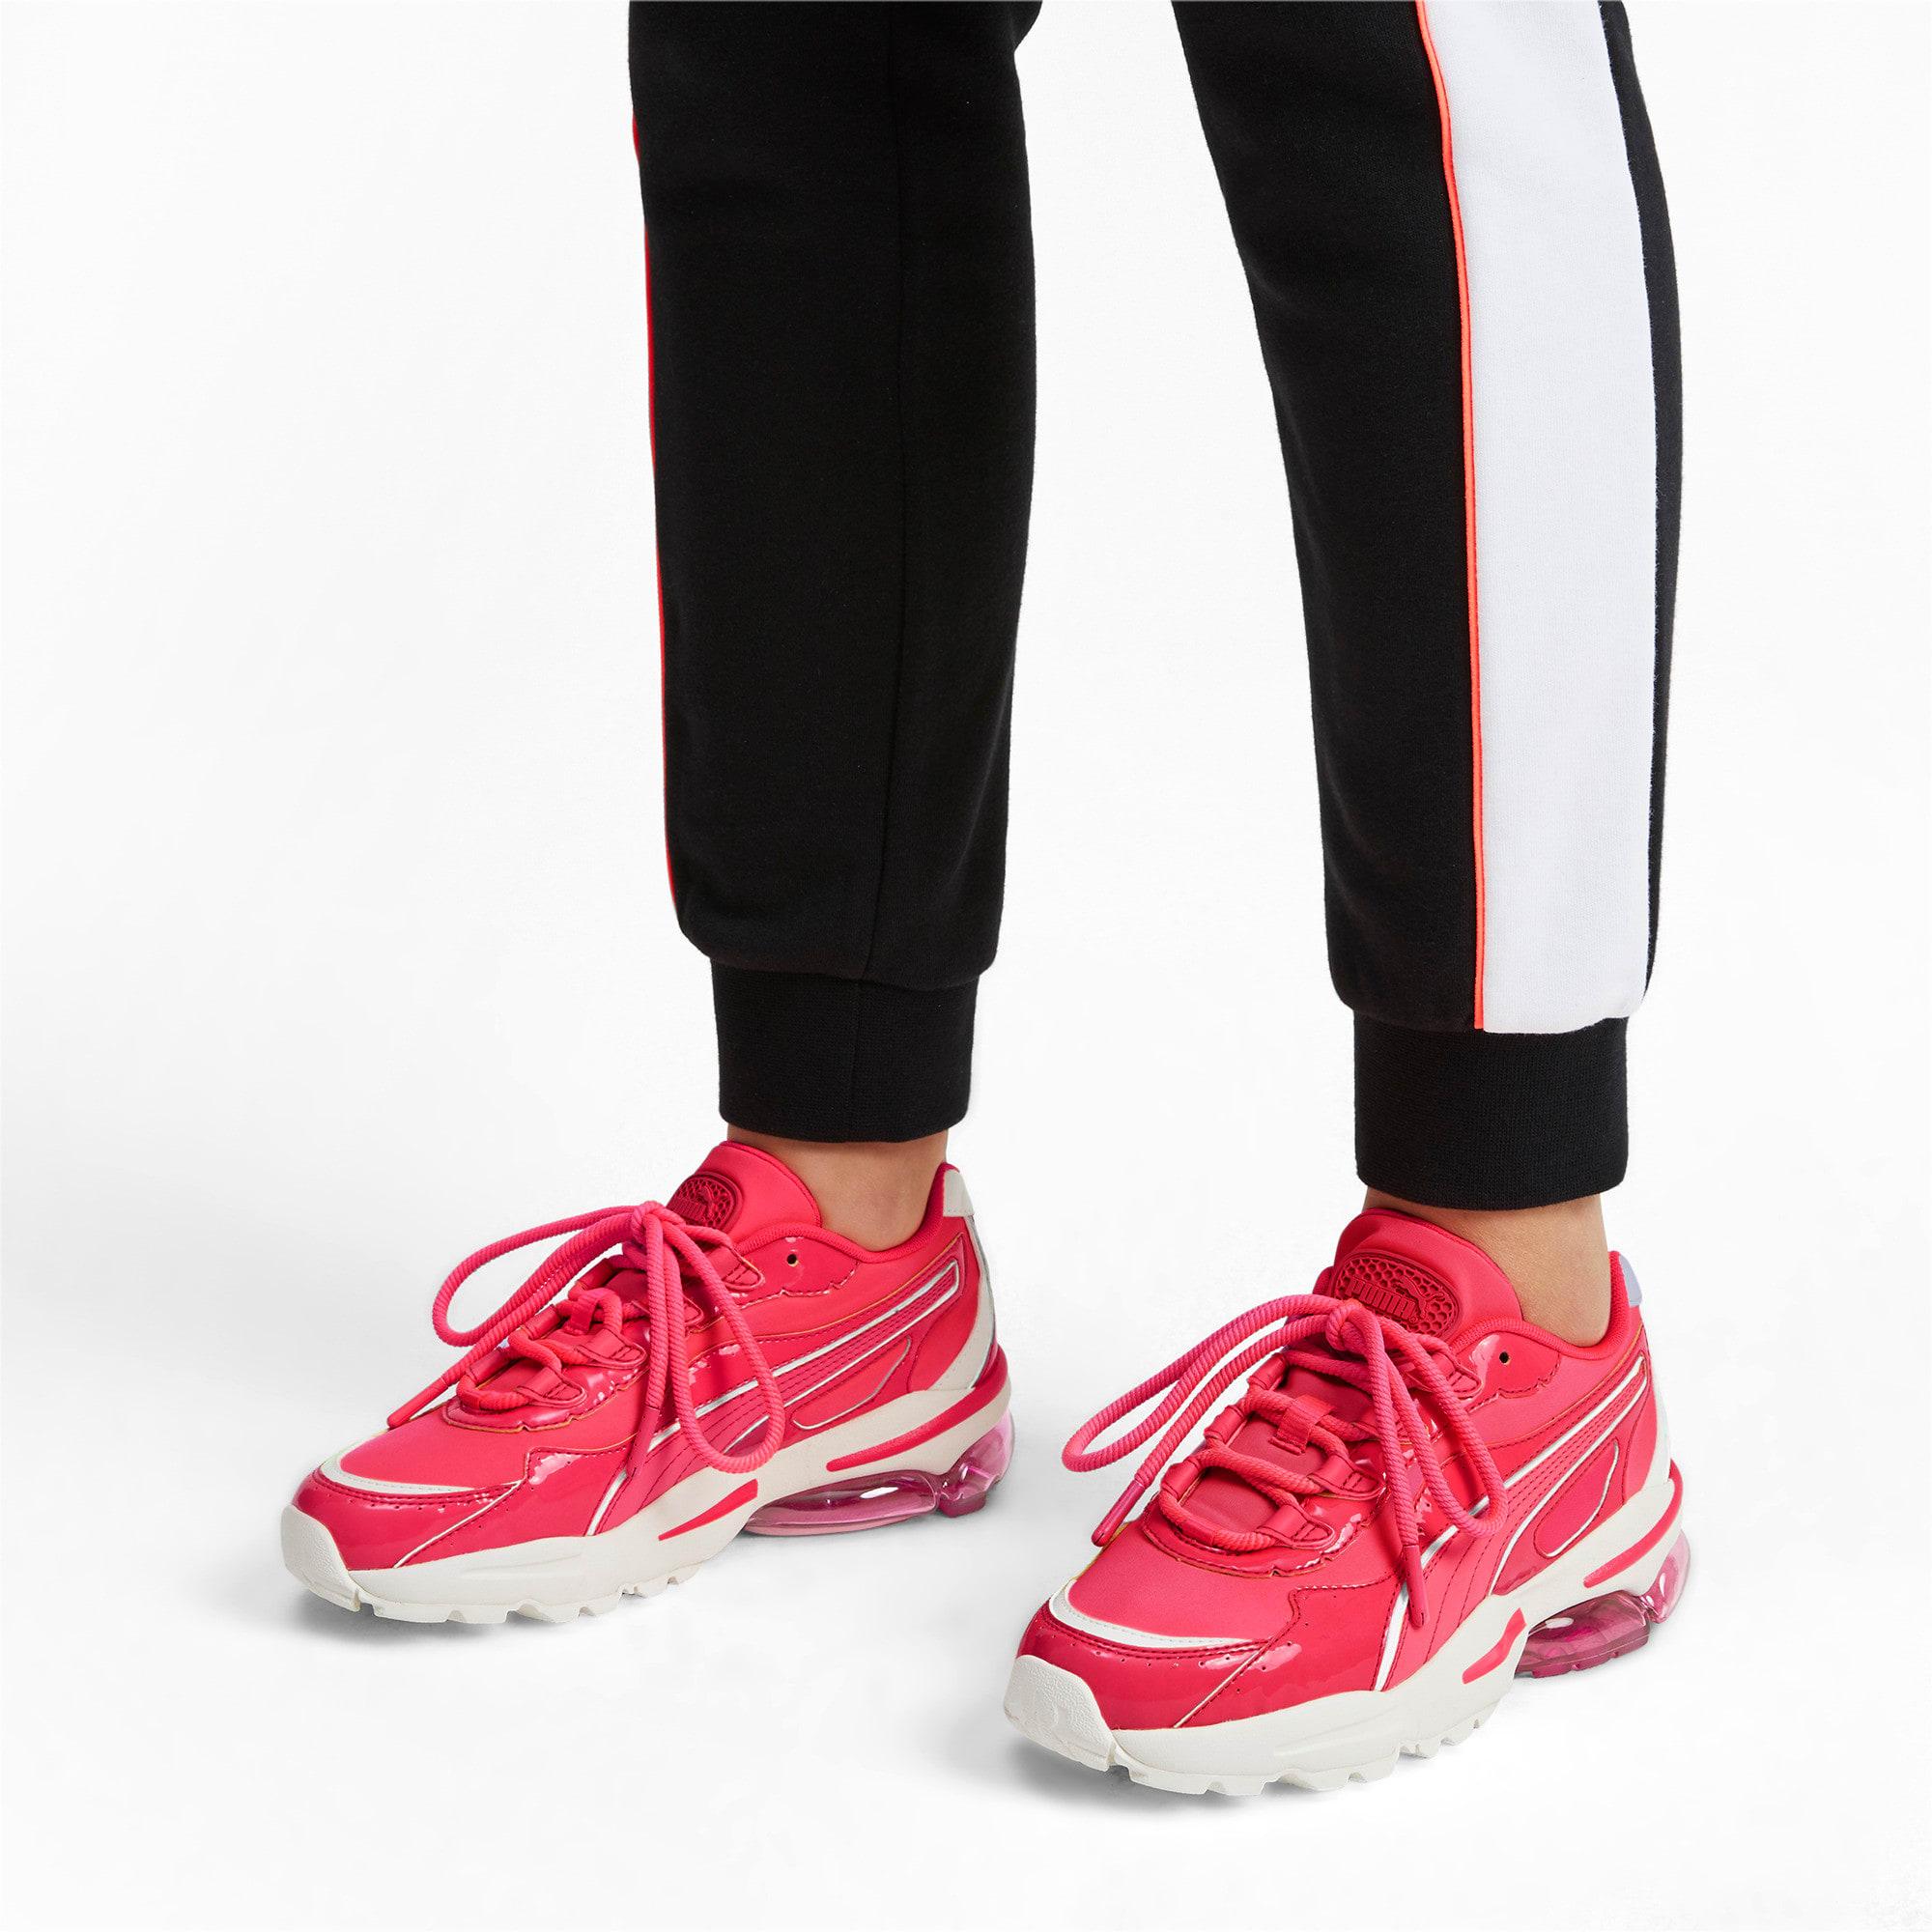 Thumbnail 2 of CELL Stellar Neon Women's Sneakers, Pink Alert-Heather, medium